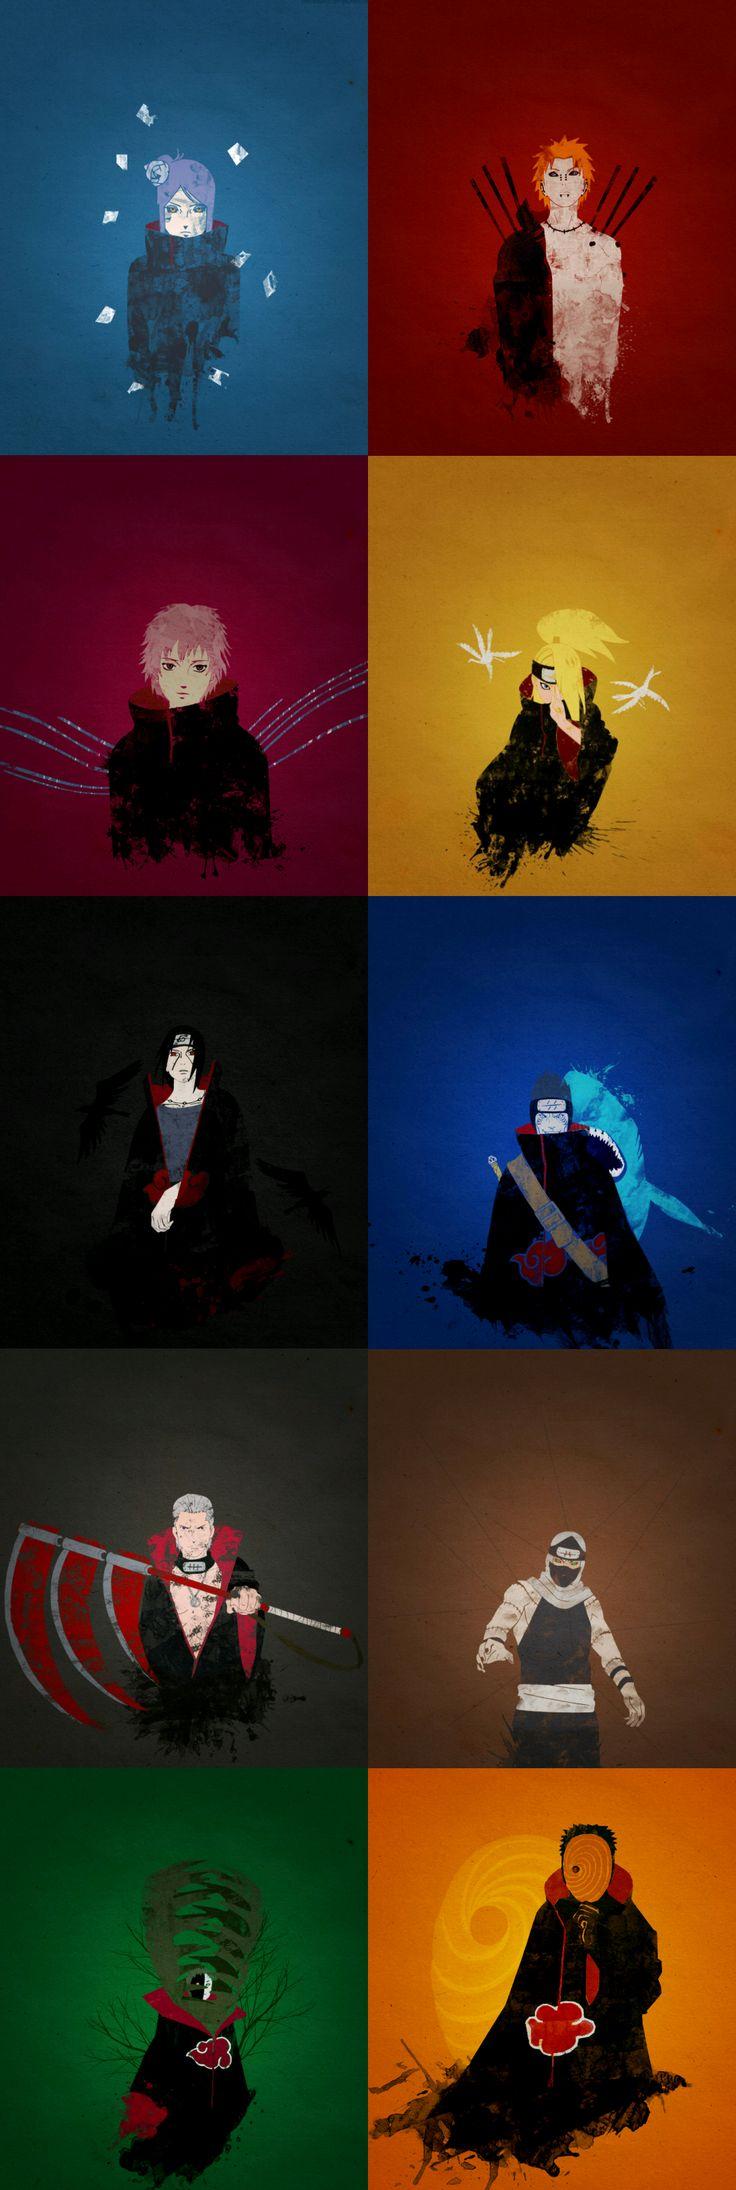 Akatsuki!! Put together by Makkura Murasaki, https://www.pinterest.com/UchihaLove/ Please do not delete the description,